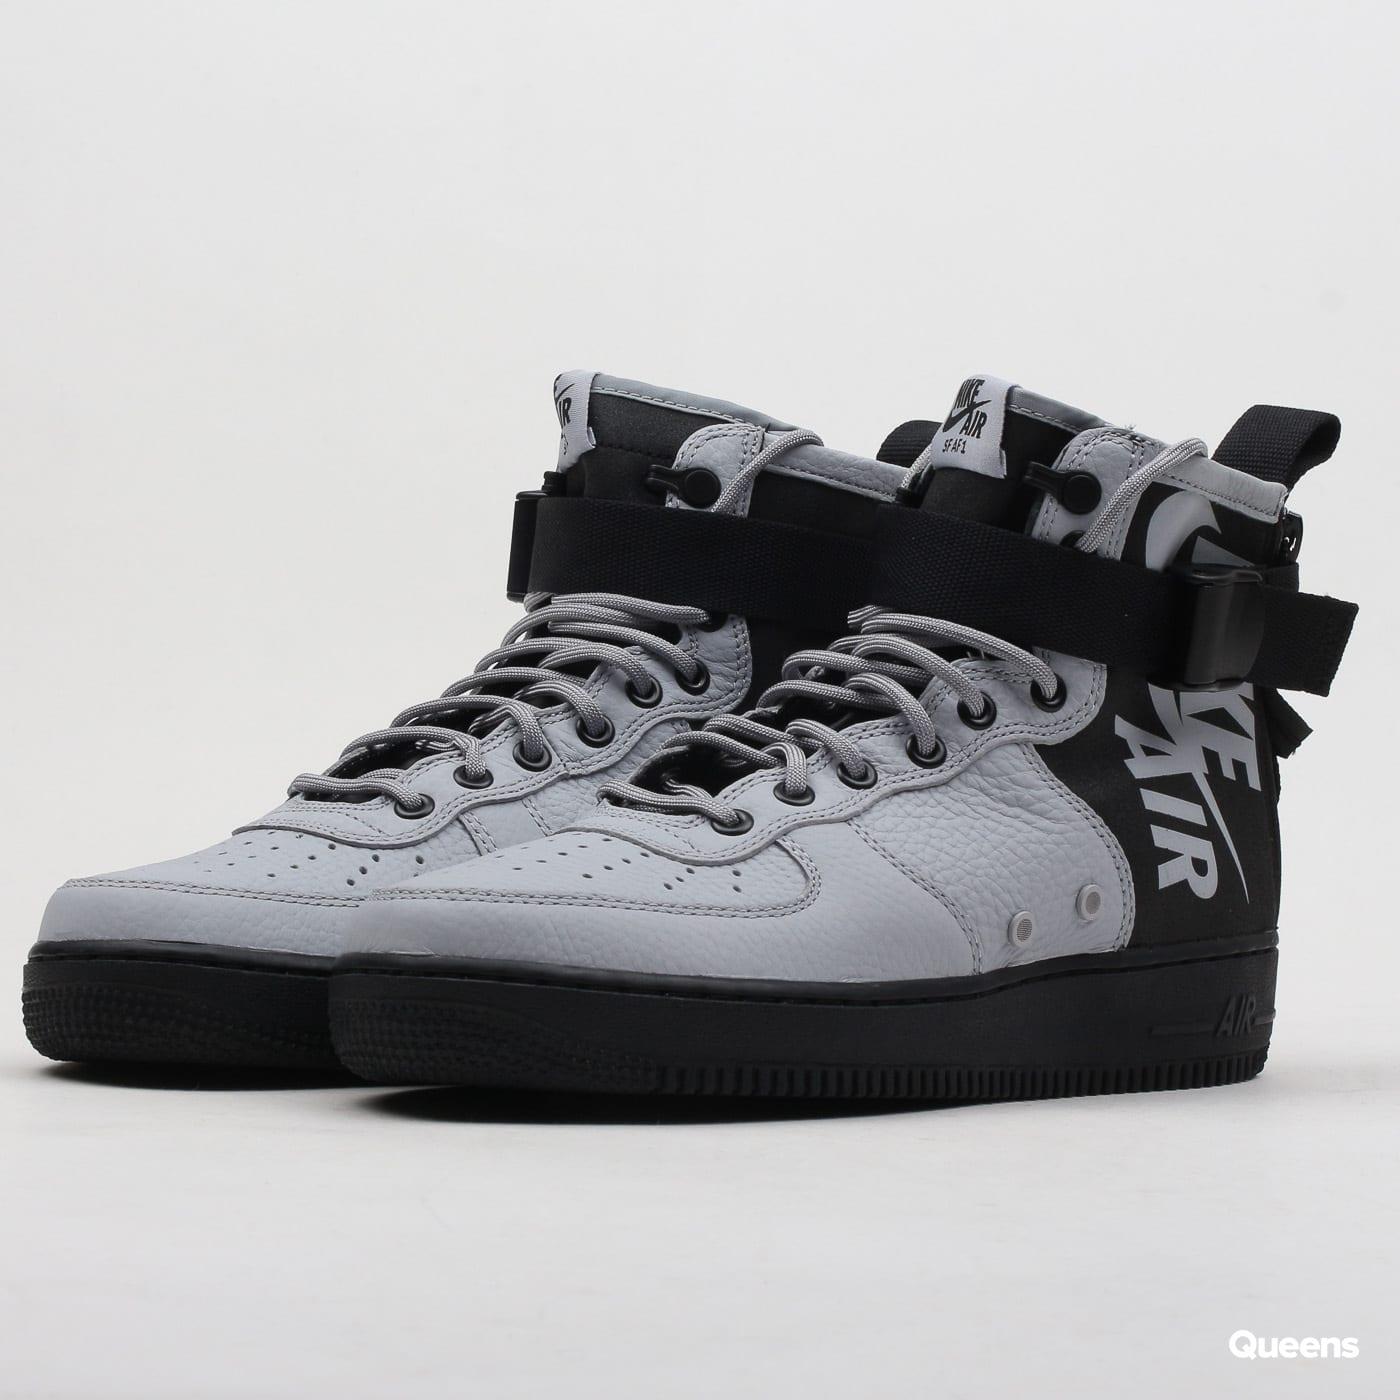 a6953f62b81 Sneakers Nike SF AF1 Mid wolf grey / wolf grey - black (917753-009) –  Queens 💚